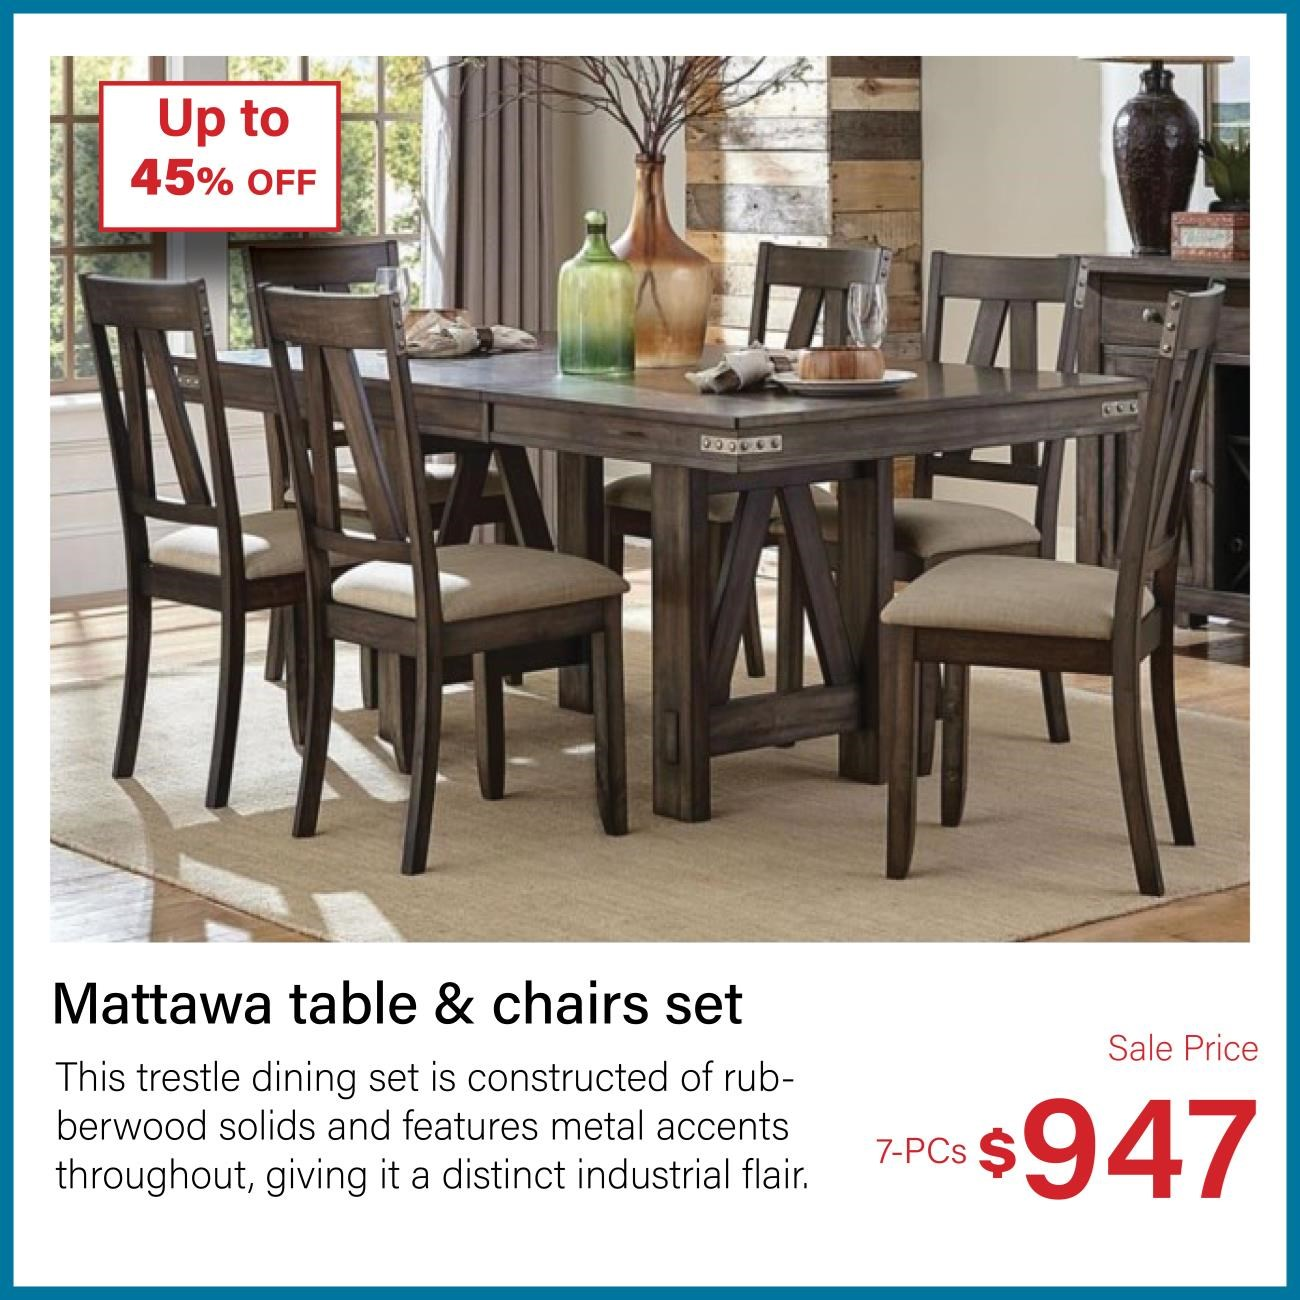 mattawa 7-pc table and chair set